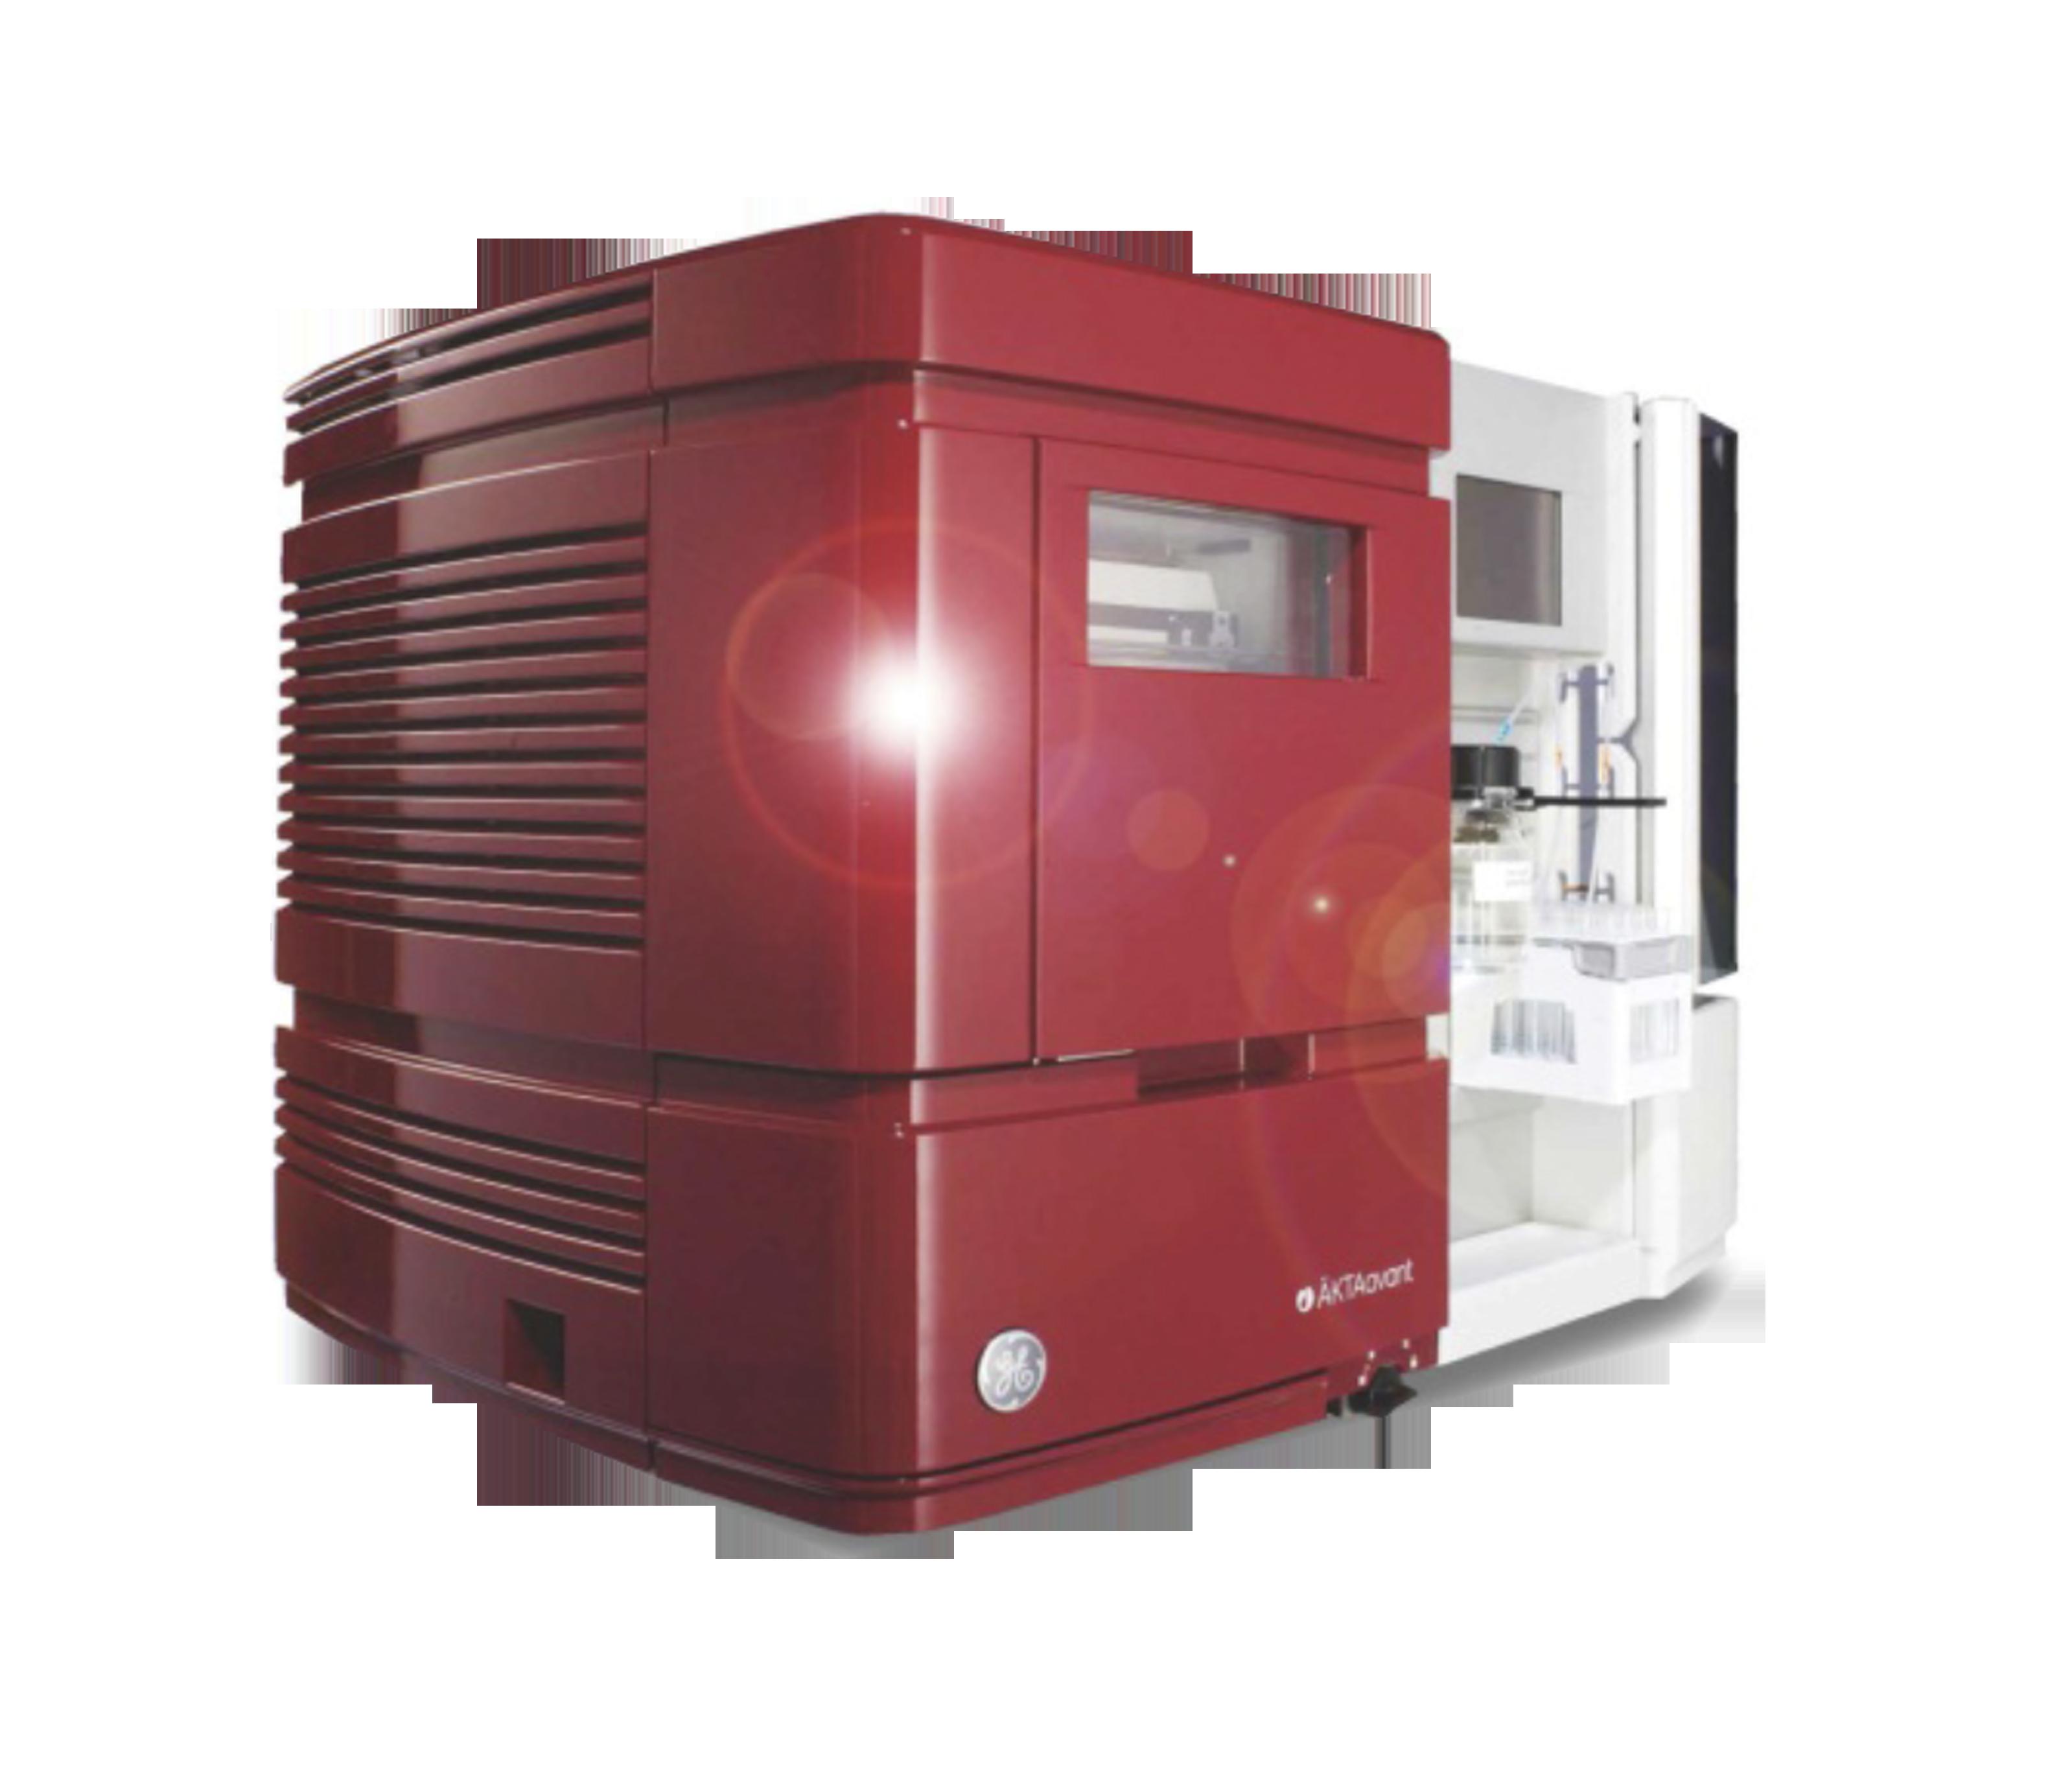 GE AKTA Start实验室蛋白质层析系统